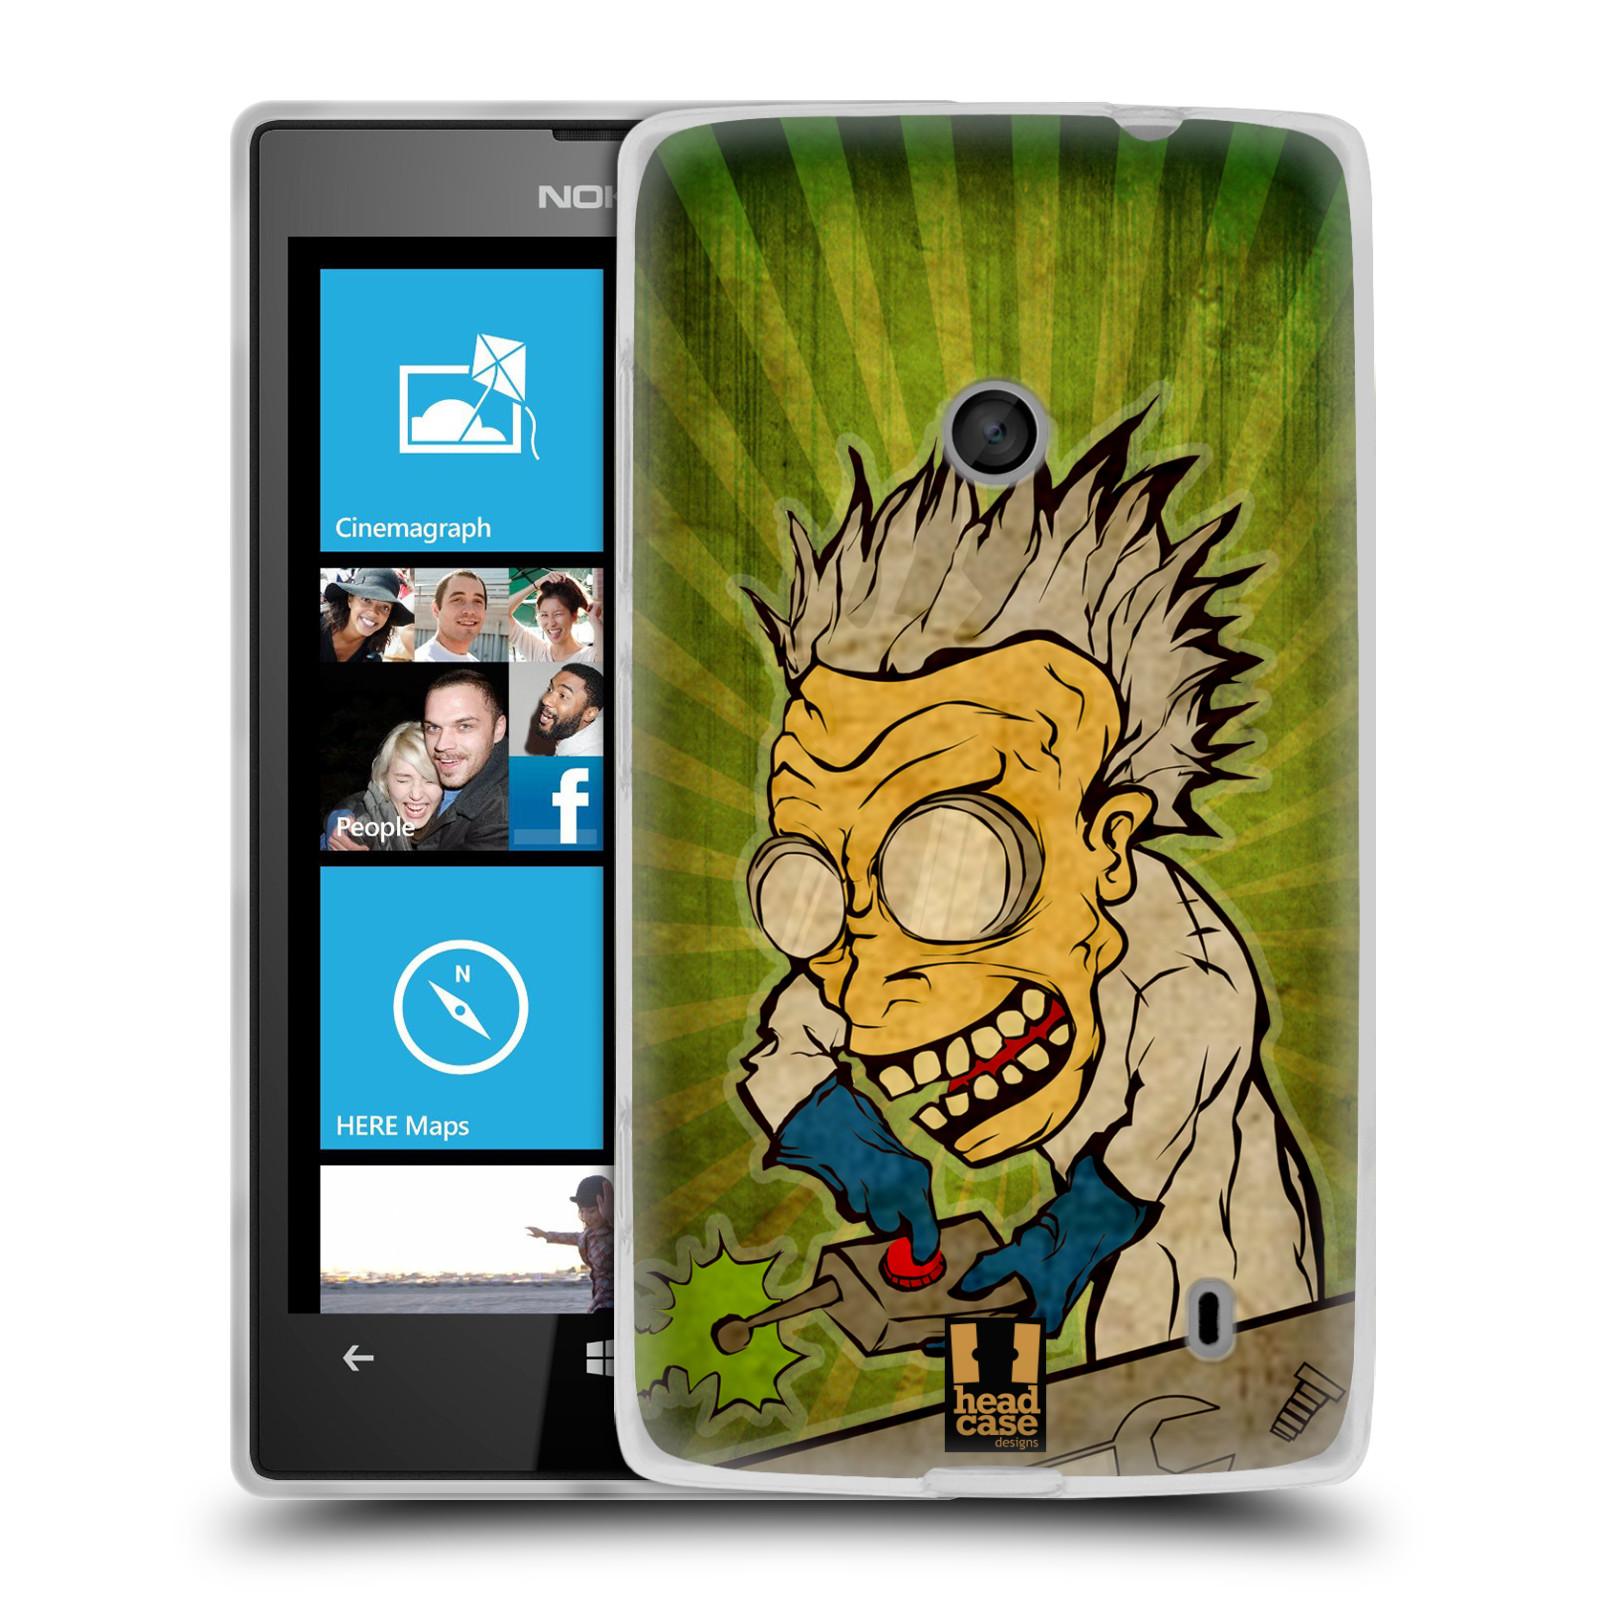 Silikonové pouzdro na mobil Nokia Lumia 520 HEAD CASE INFUSE (Silikonový Kryt či obal na mobilní telefon Nokia Lumia 520)